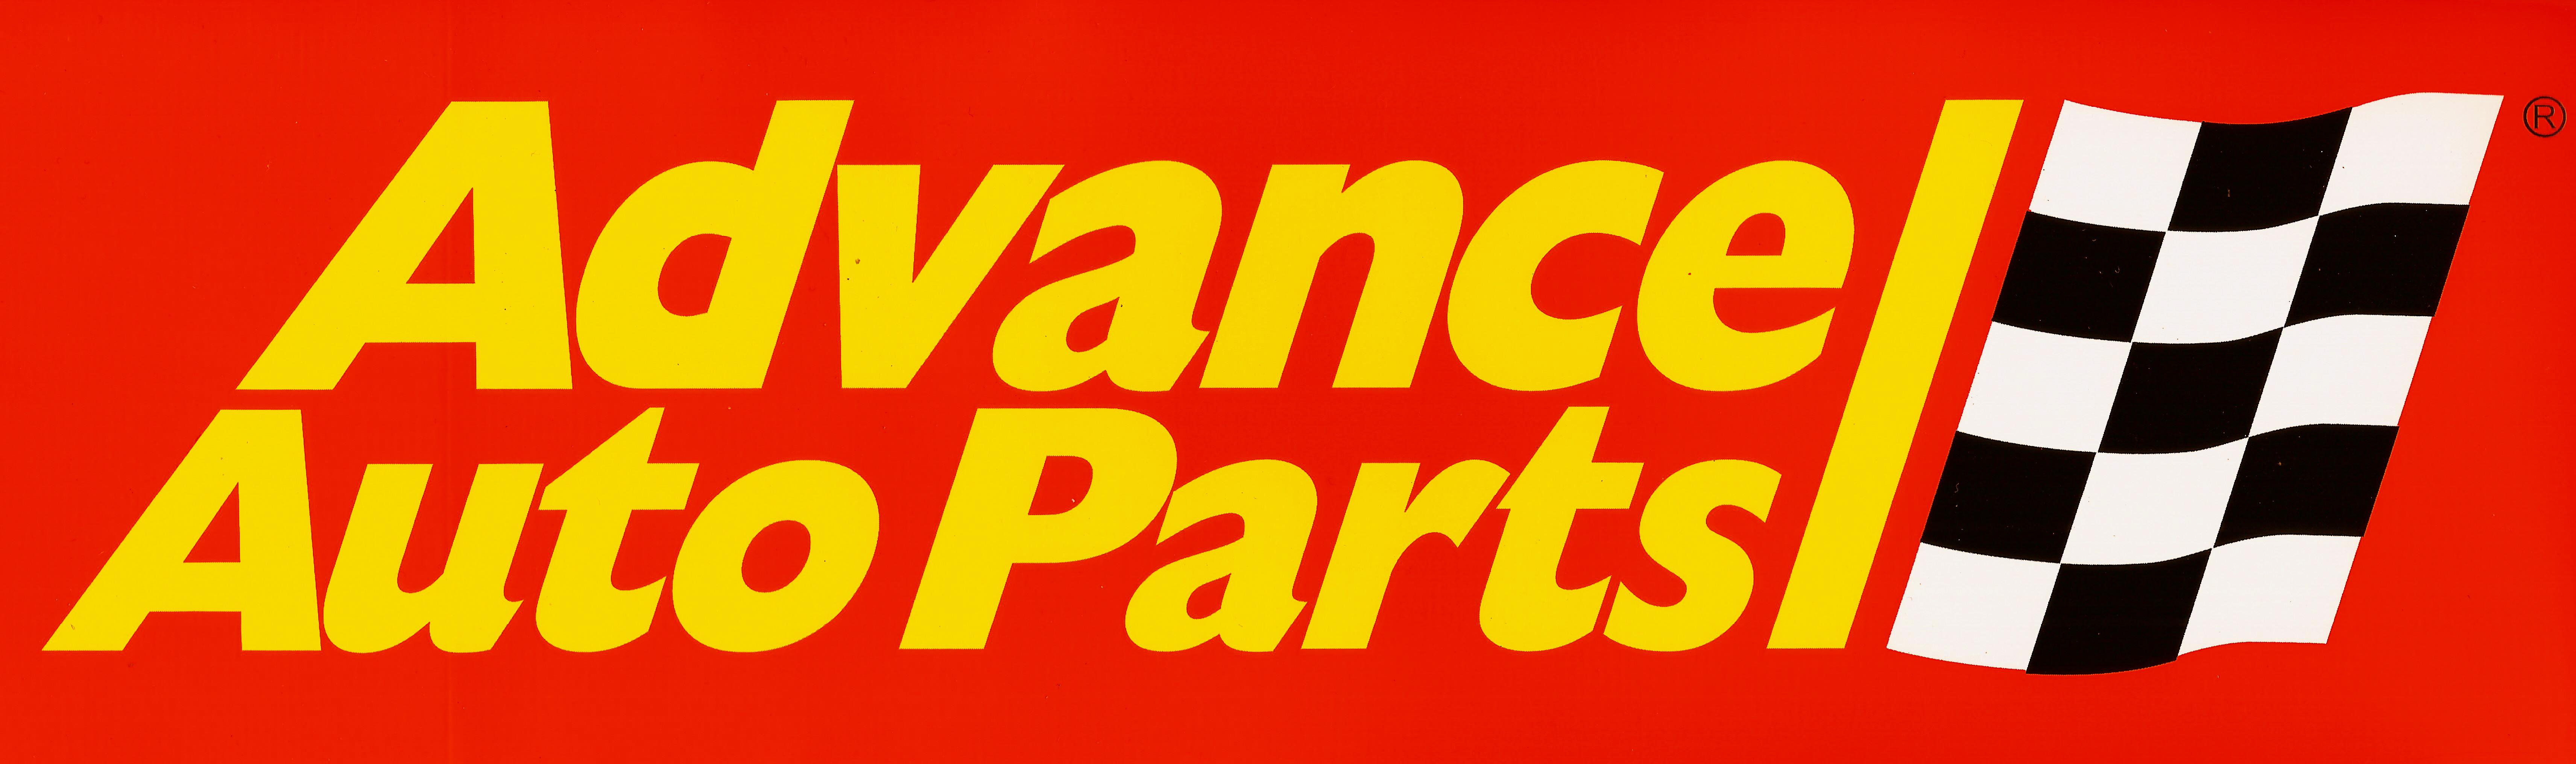 New Age Automotive Svc Llc. | Auto Repair Mt. Holly NC | Engine Repair Gastonia NC | Brake ...